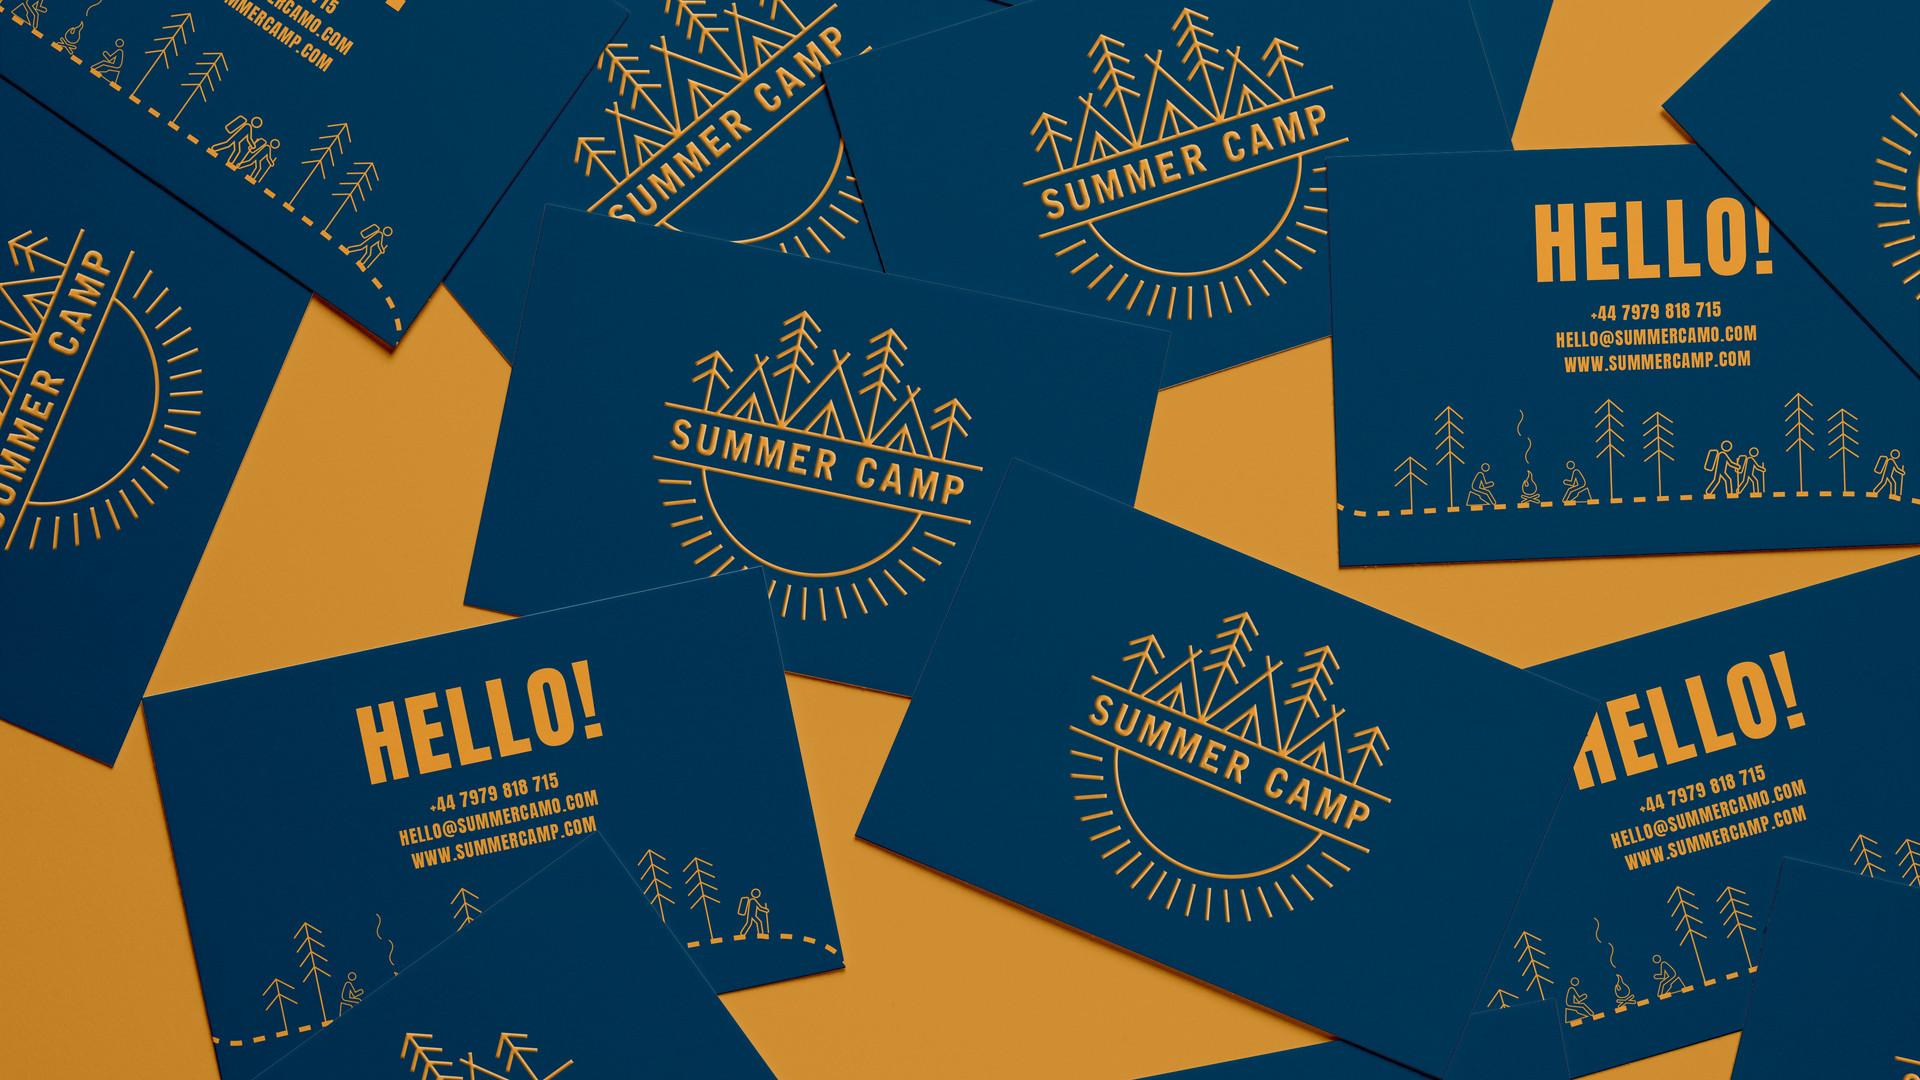 Business Cards.jpg